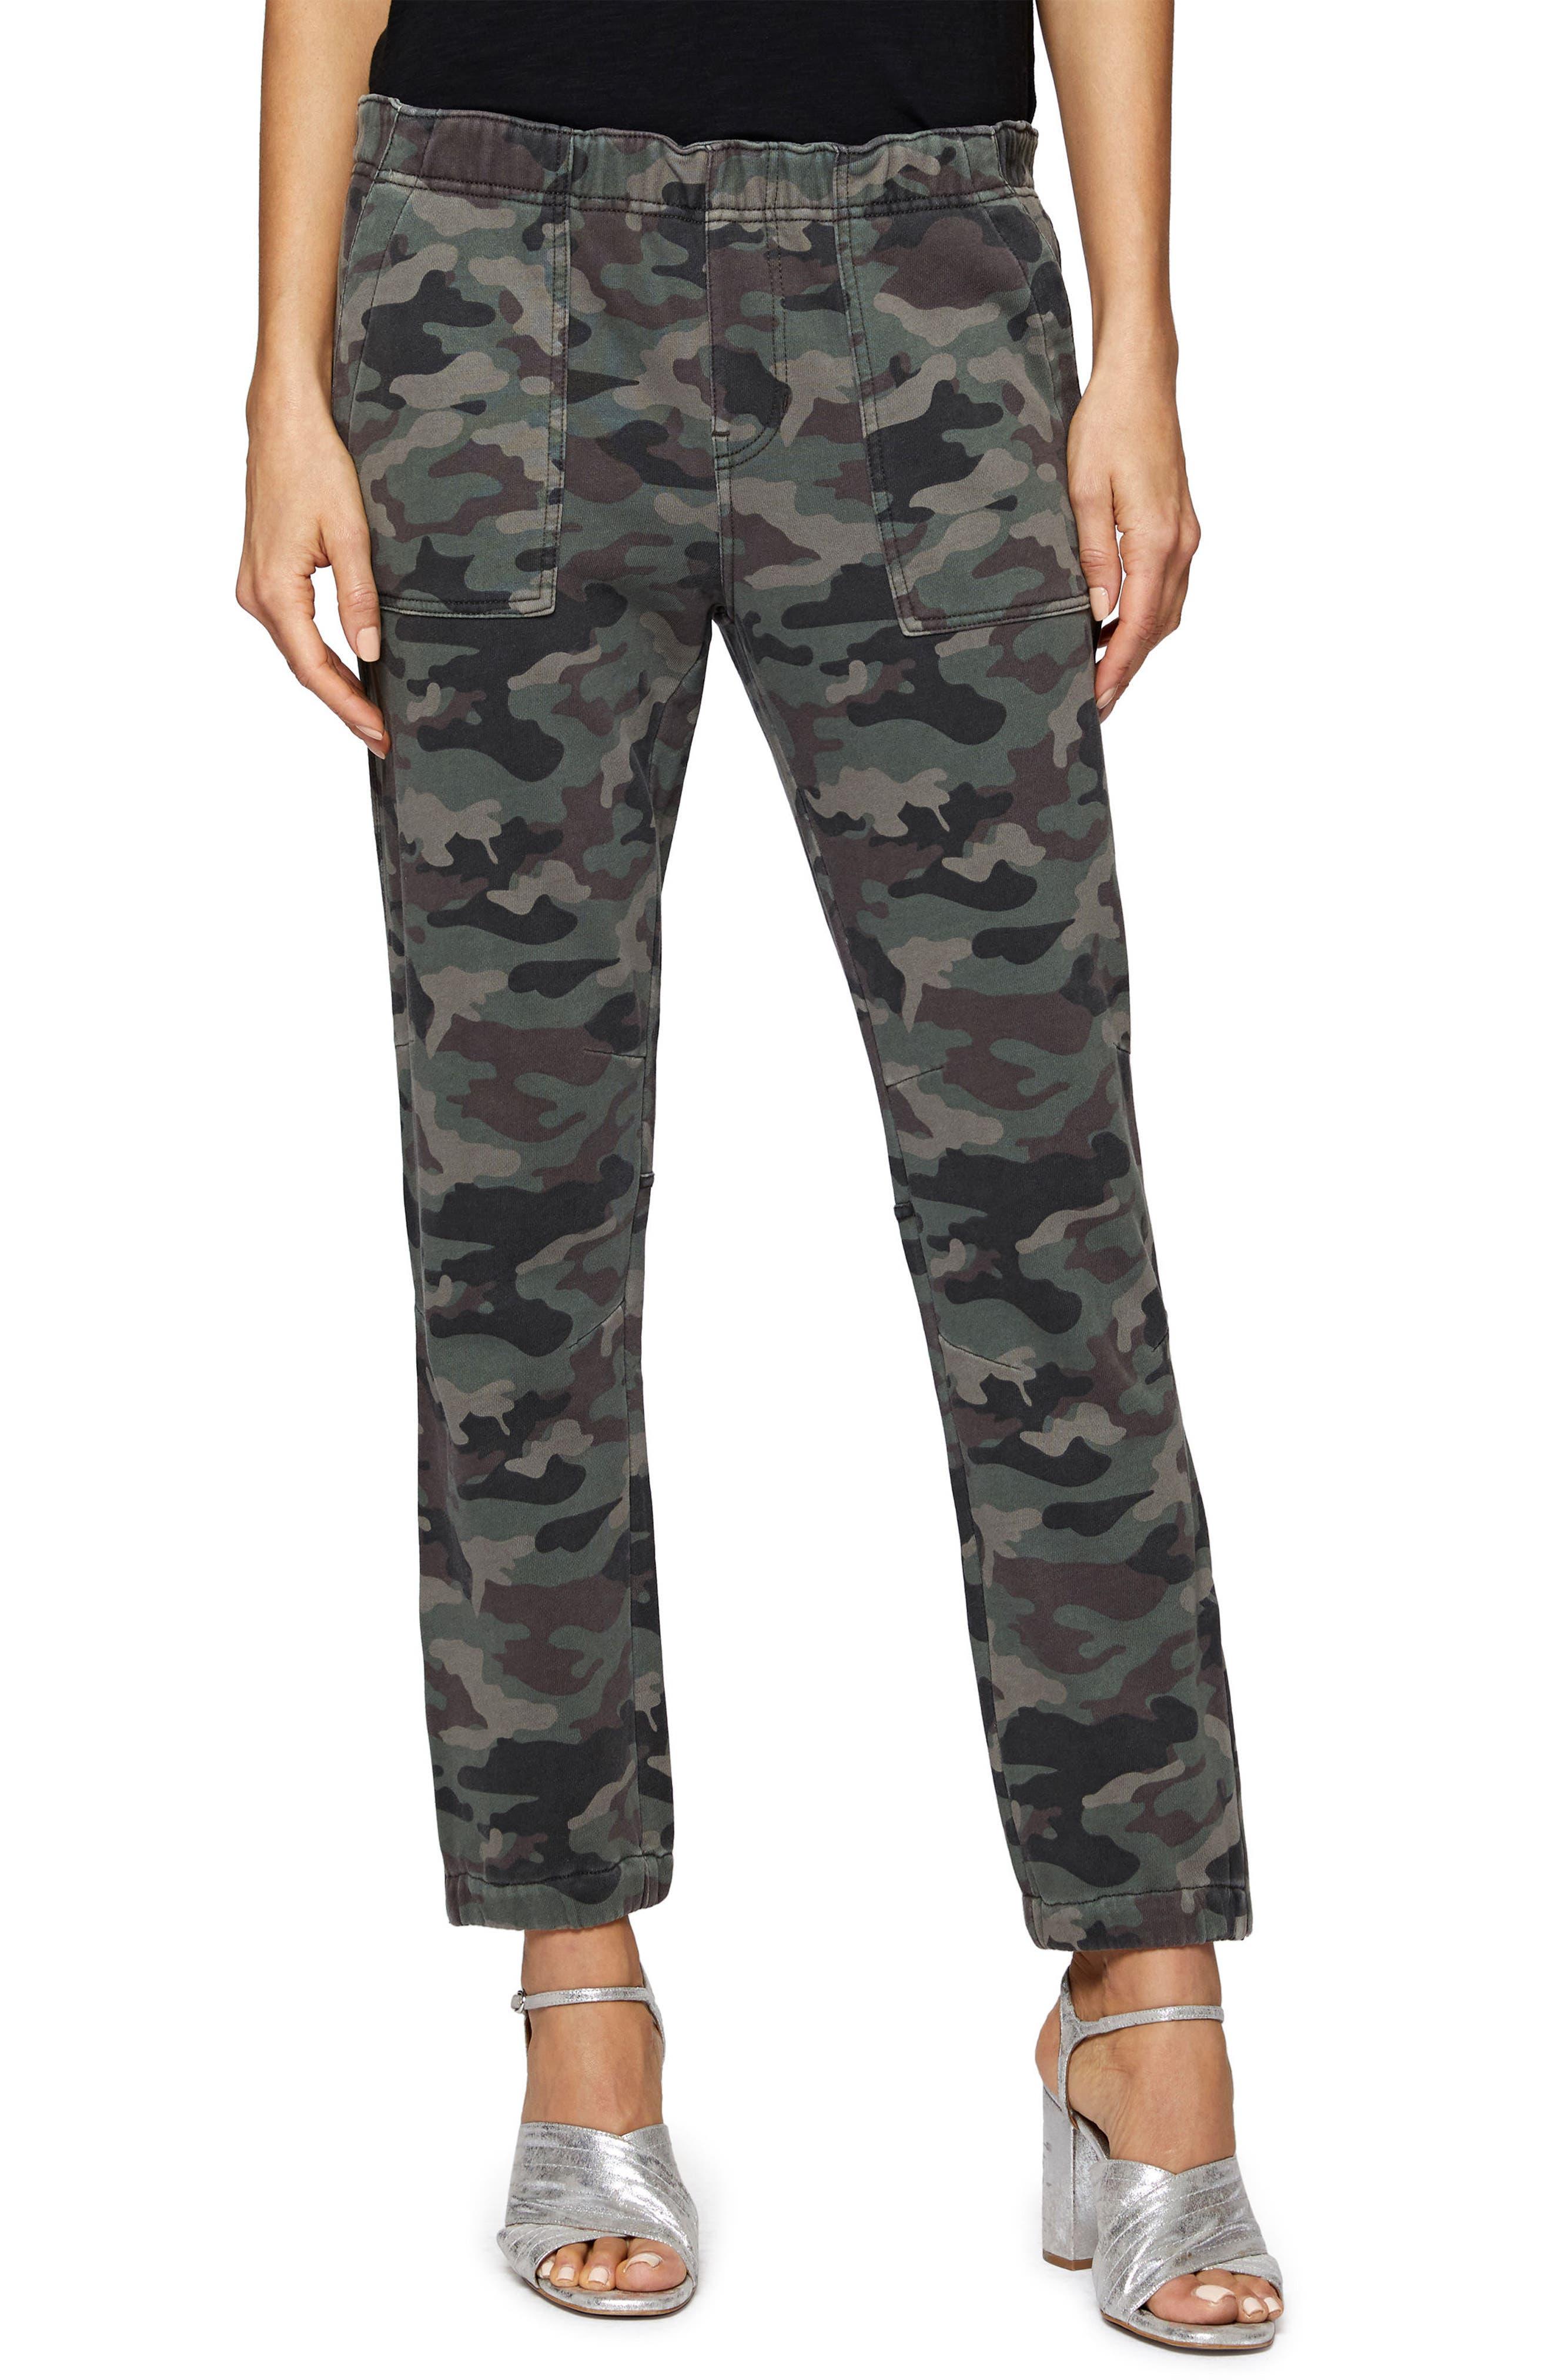 Alternate Image 1 Selected - Sanctuary Troop Camo Jogger Pants